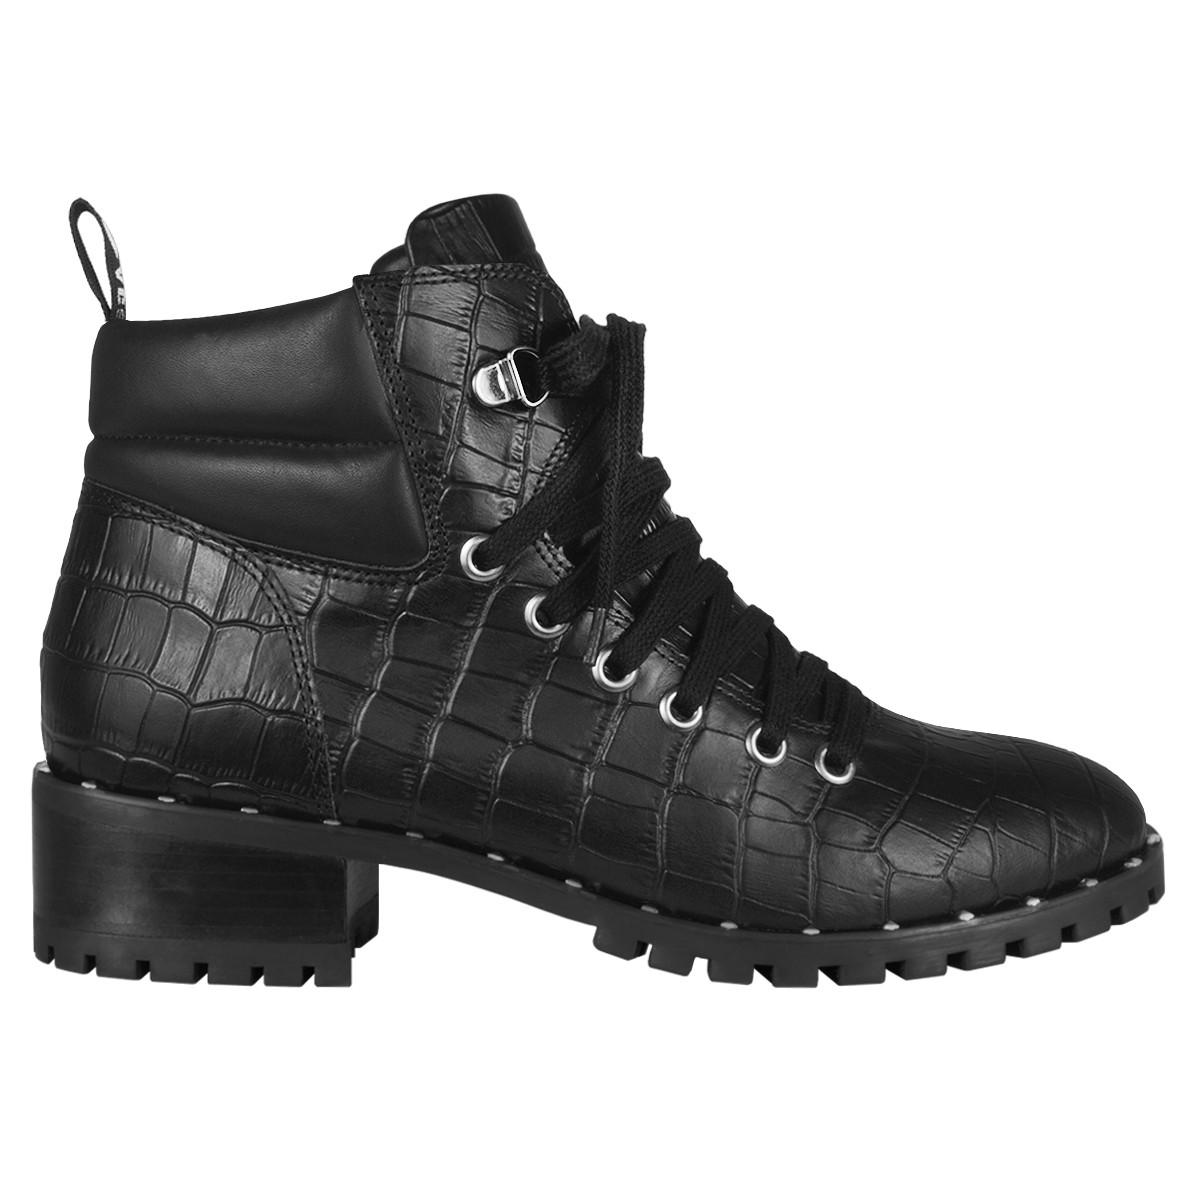 5b2a057c5 Coturno Aspen Croco Black